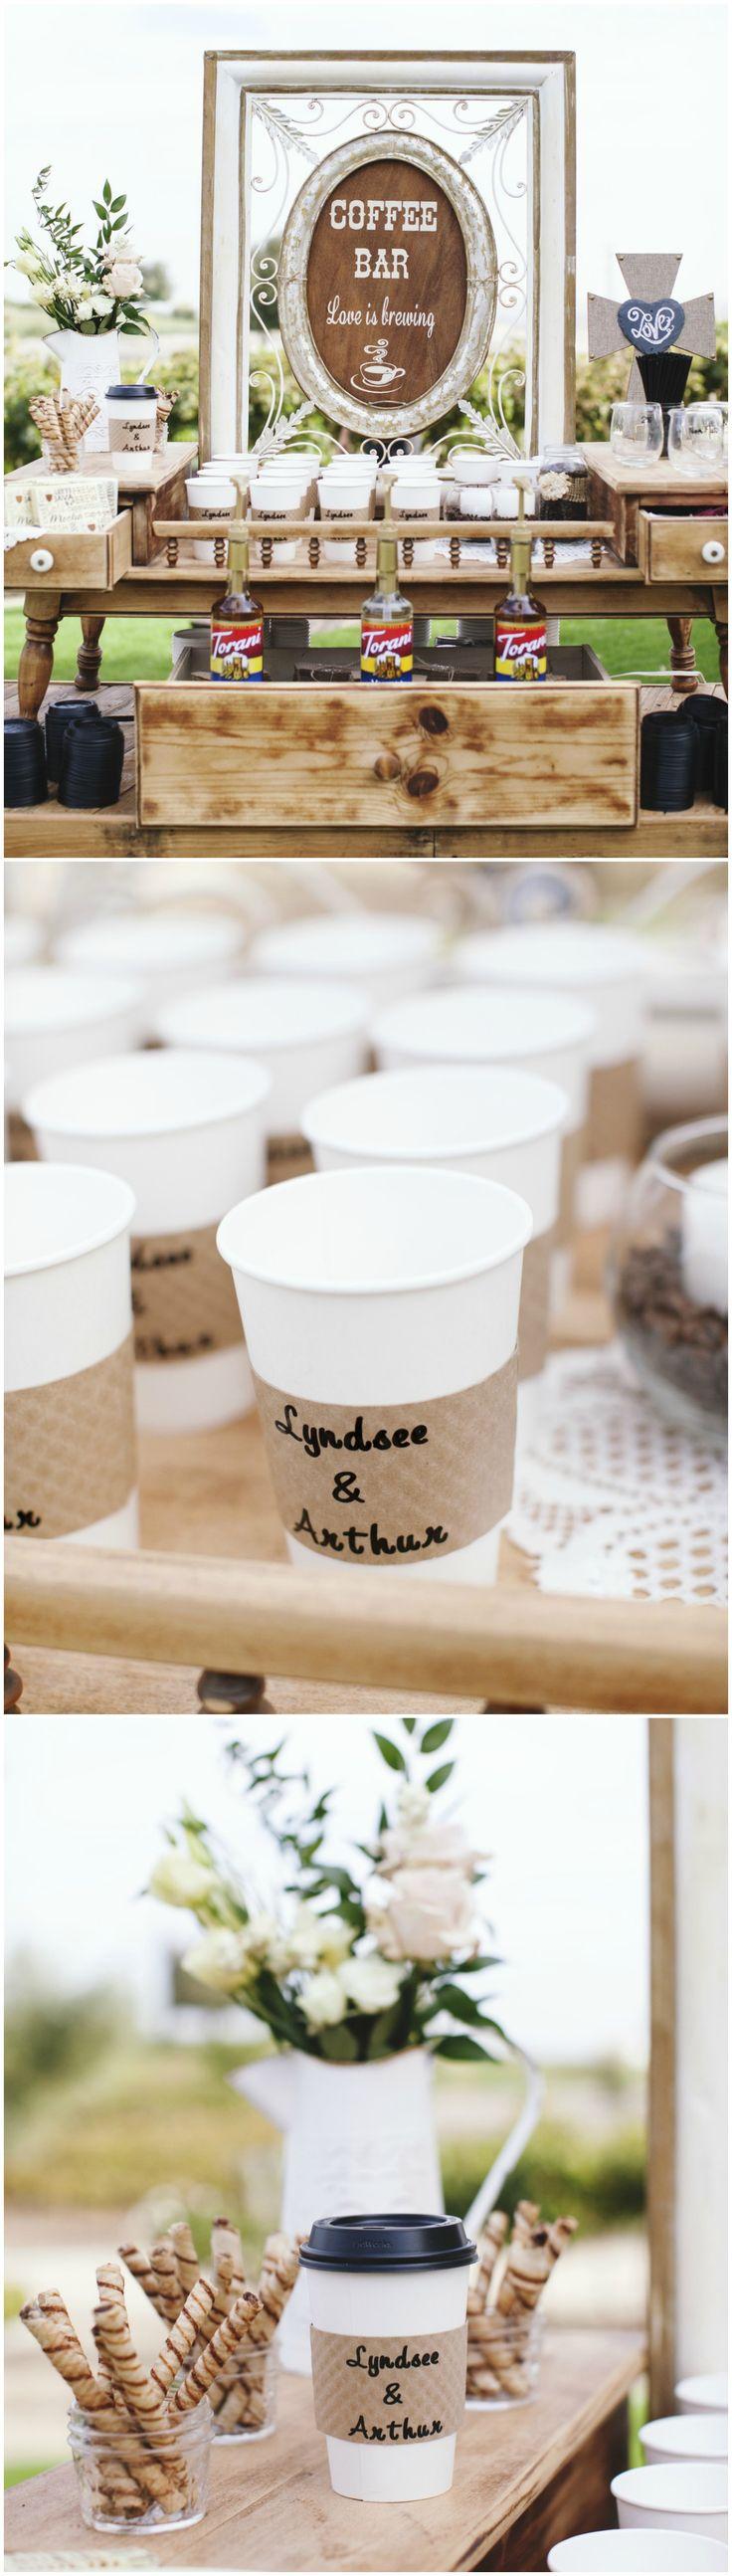 696 best Wedding Reception Ideas images on Pinterest | Wedding ...